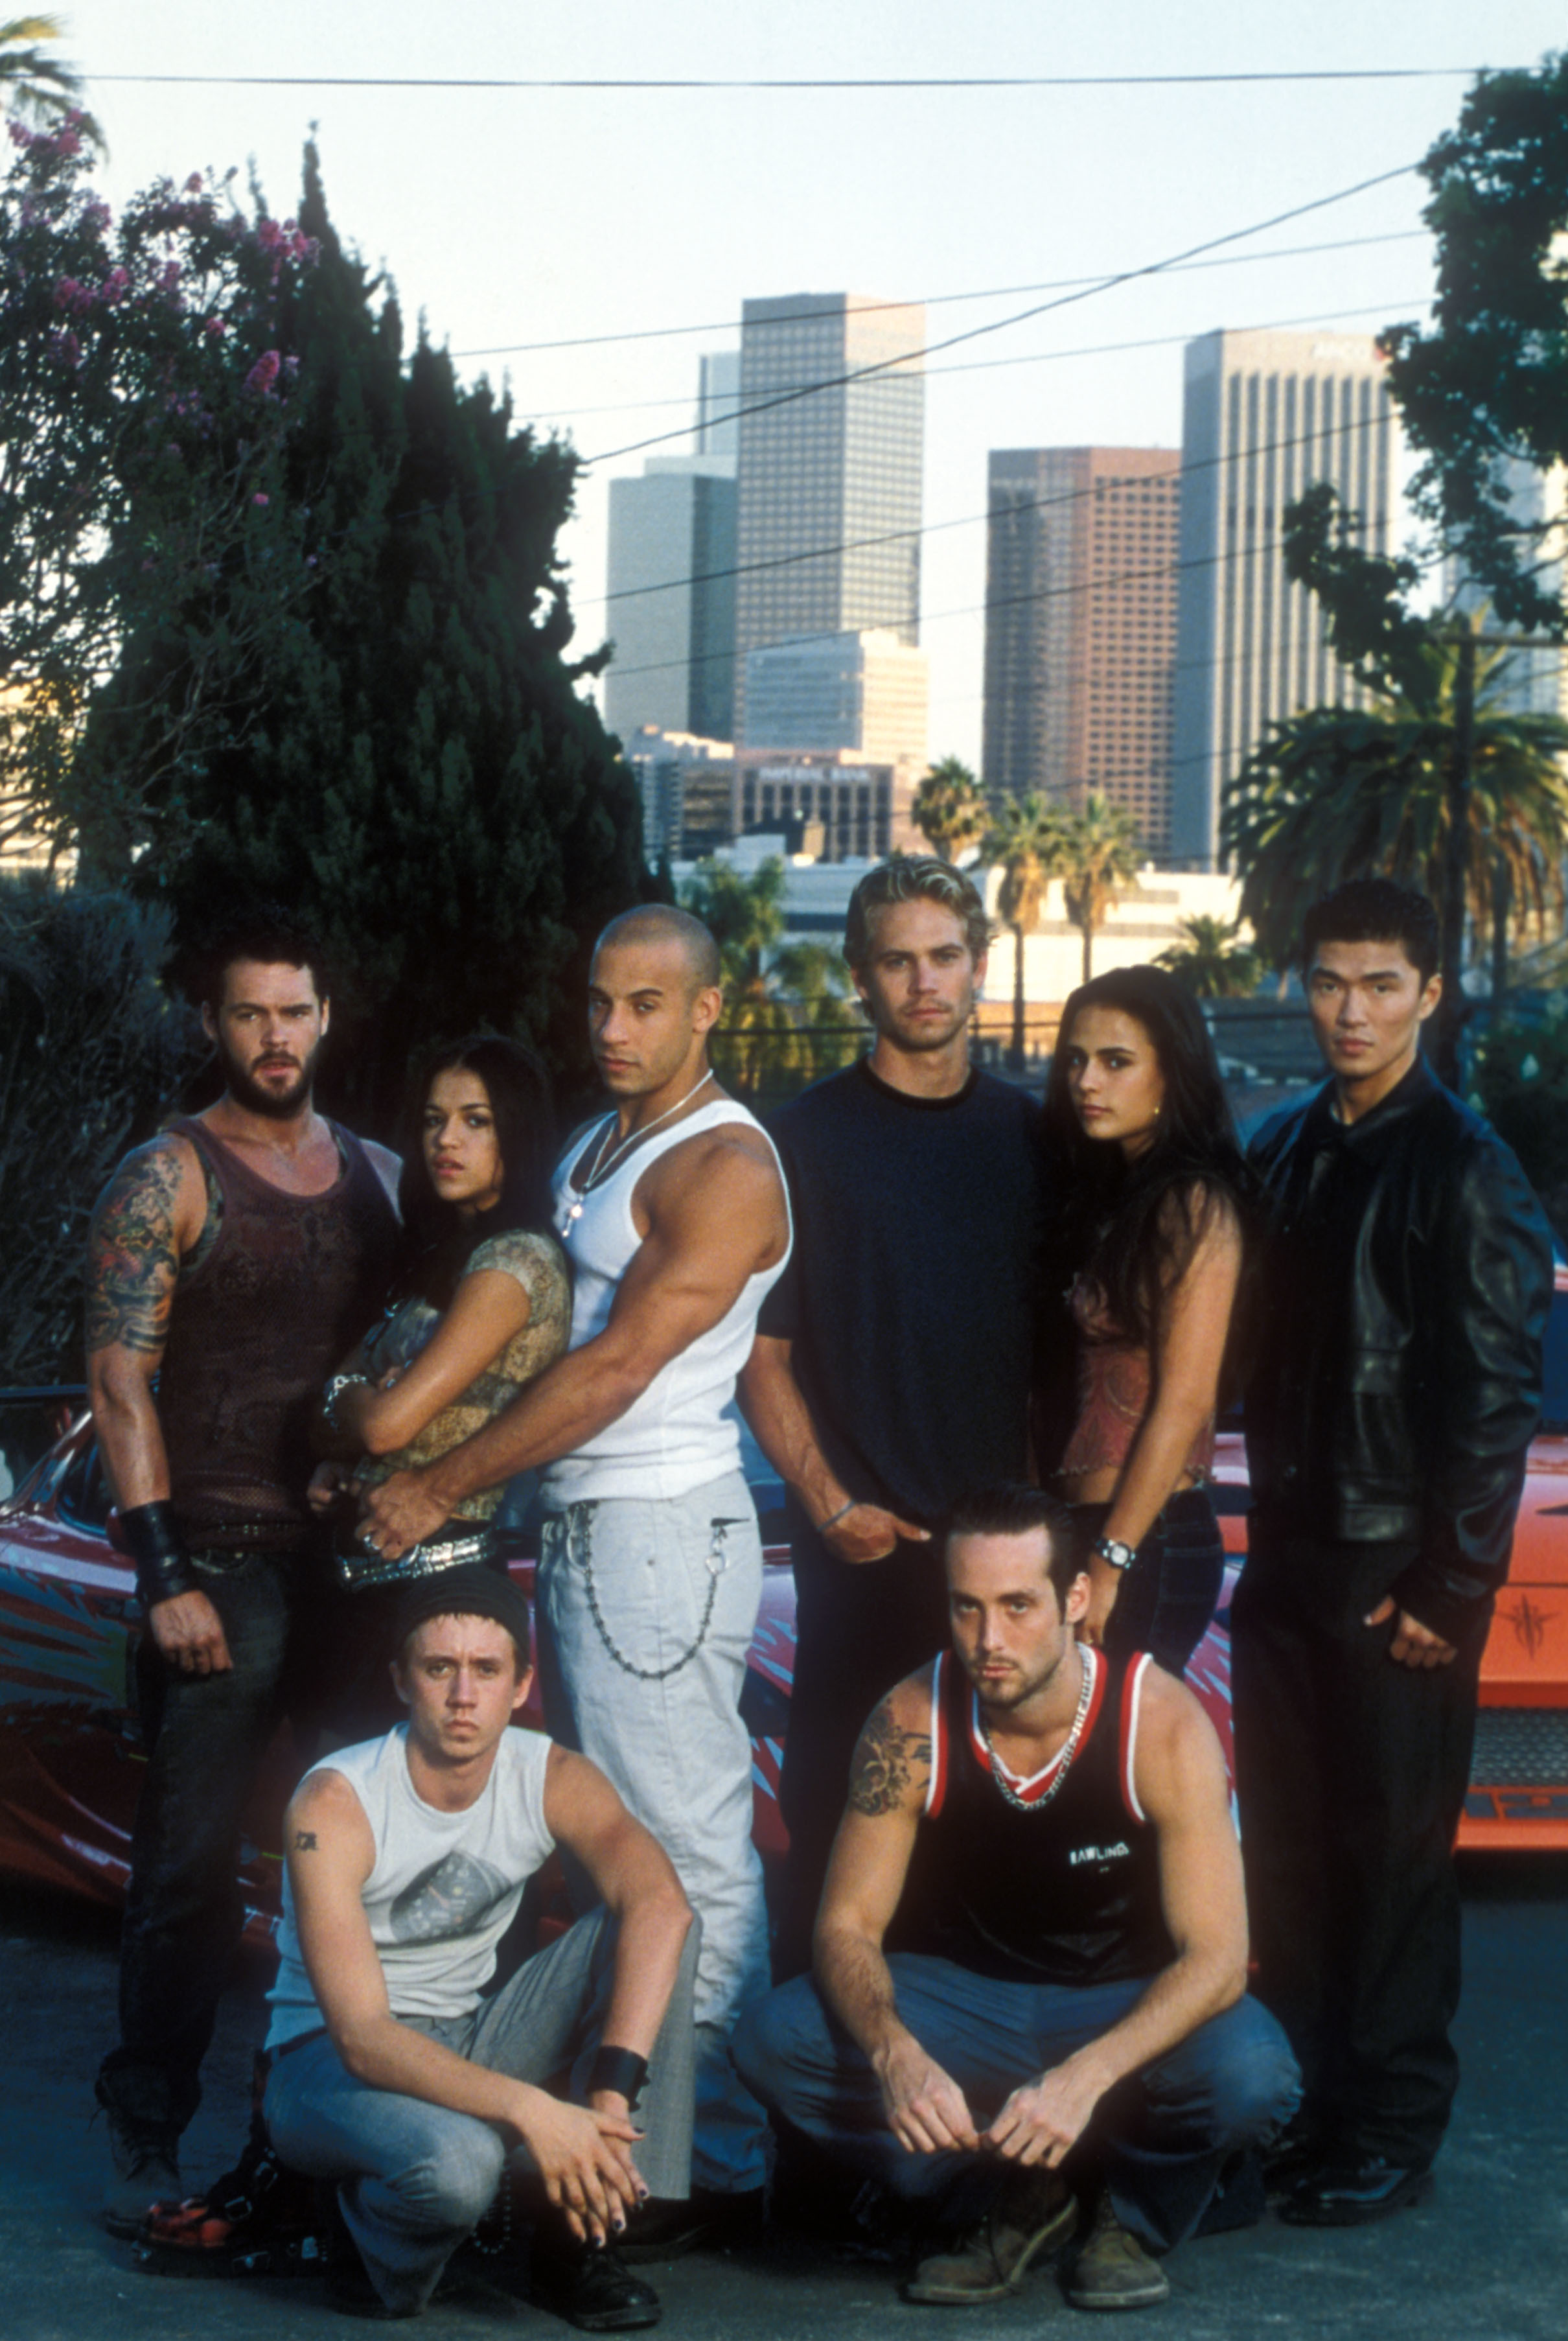 Matt Shulze, Michelle Rodriguez, Vin Diesel, Paul Walker, Jordana Brewster, Rick Yune, Chad Lindberg, Johnny Strong